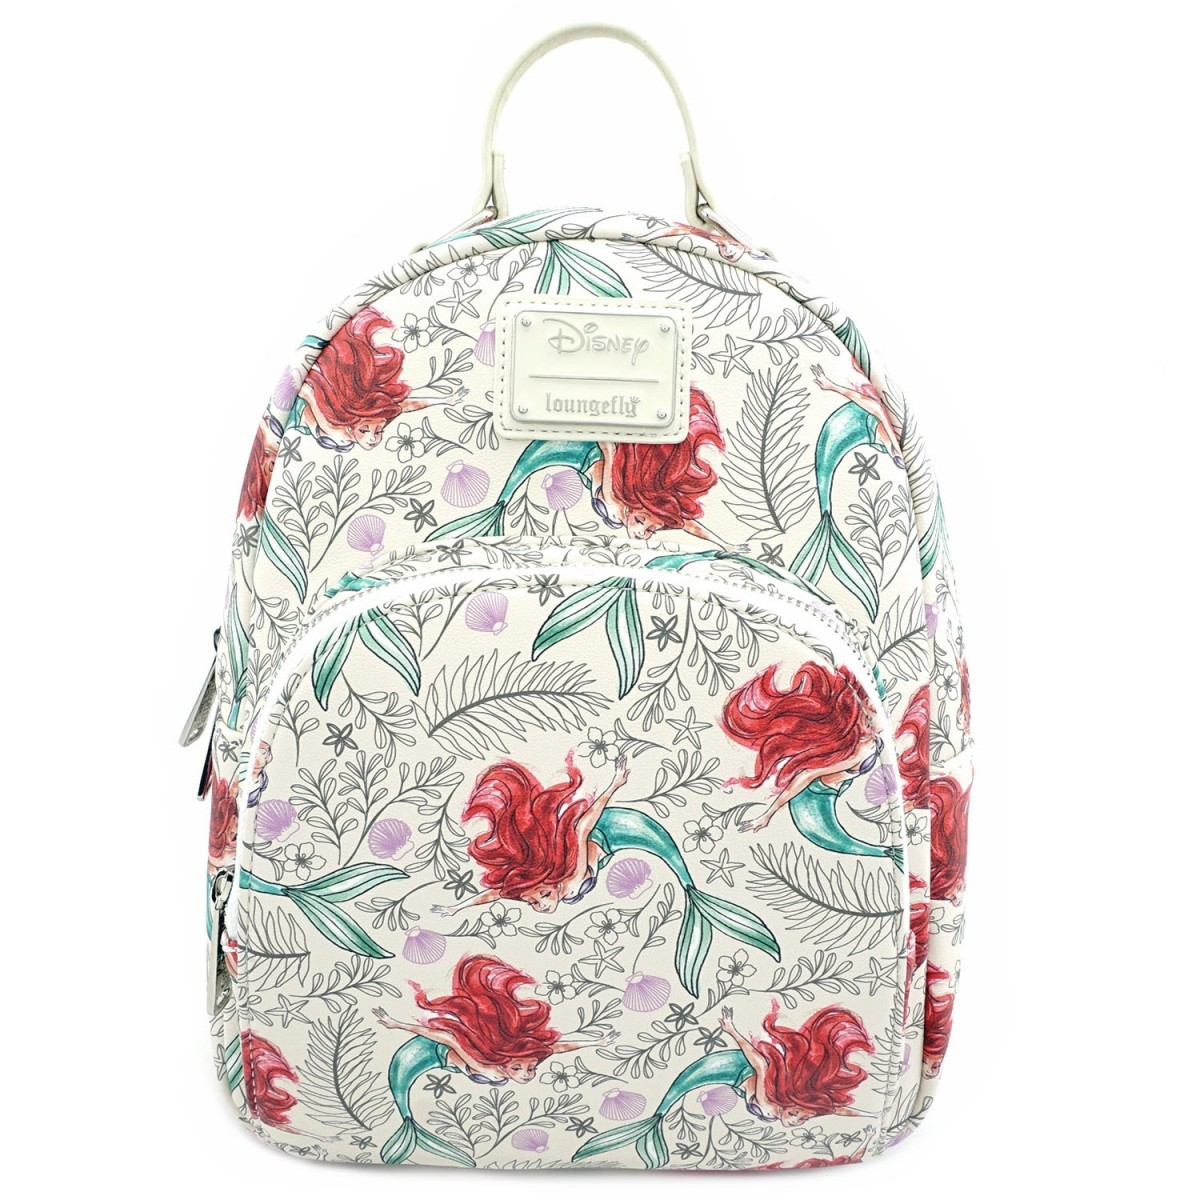 Loungefly: Little Mermaid - Ariel Sketch Print Mini Backpack image